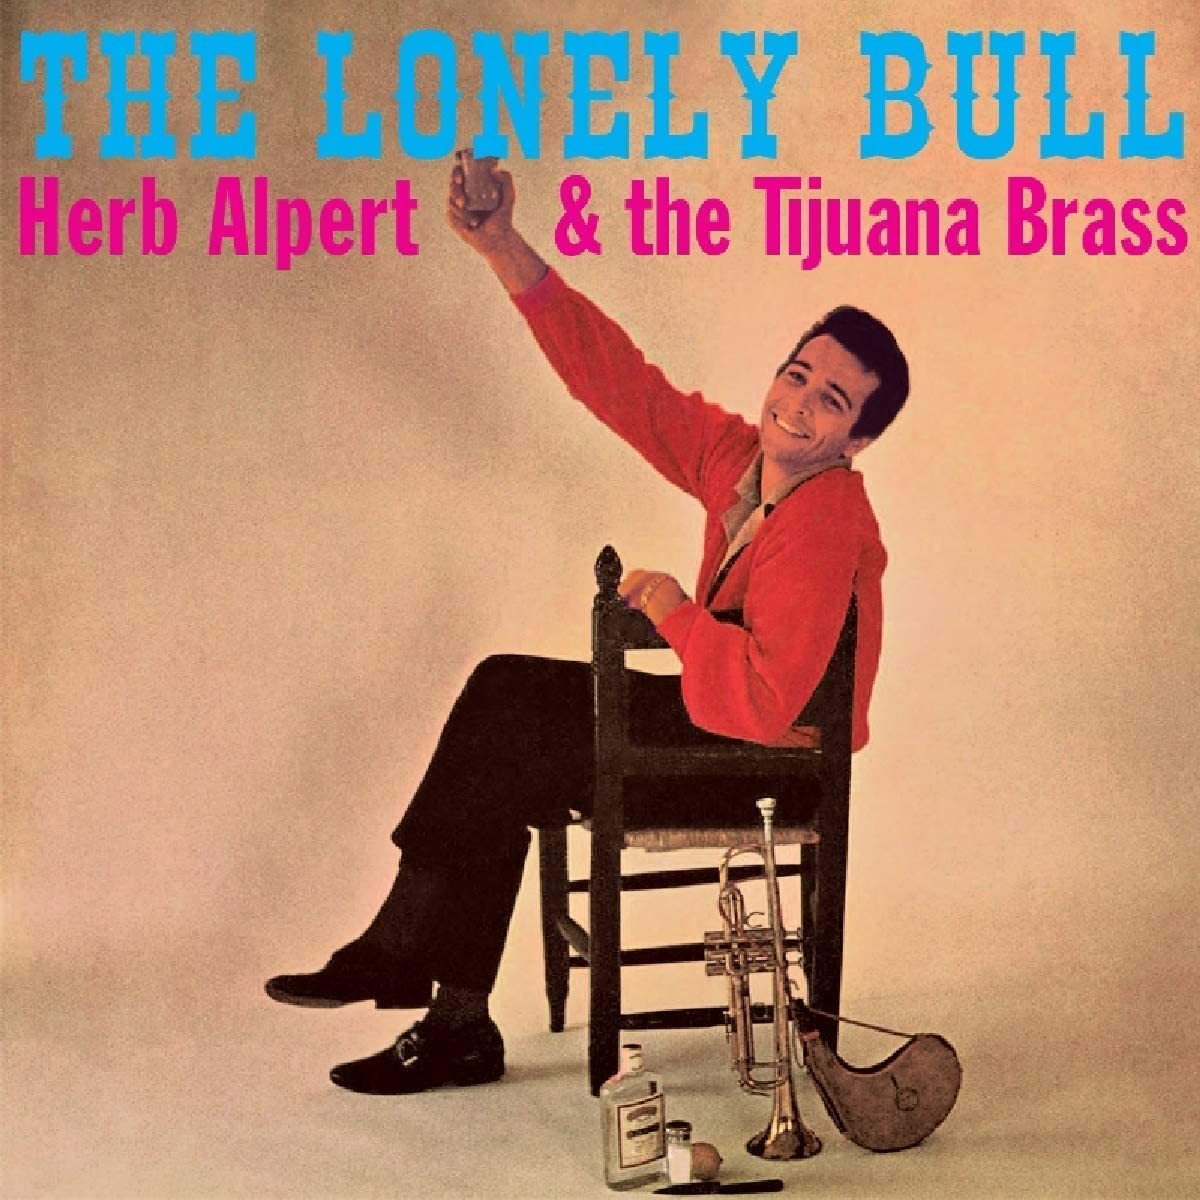 The Lonely Bull - Herb Alpert & The Tijuana Brass ('62)